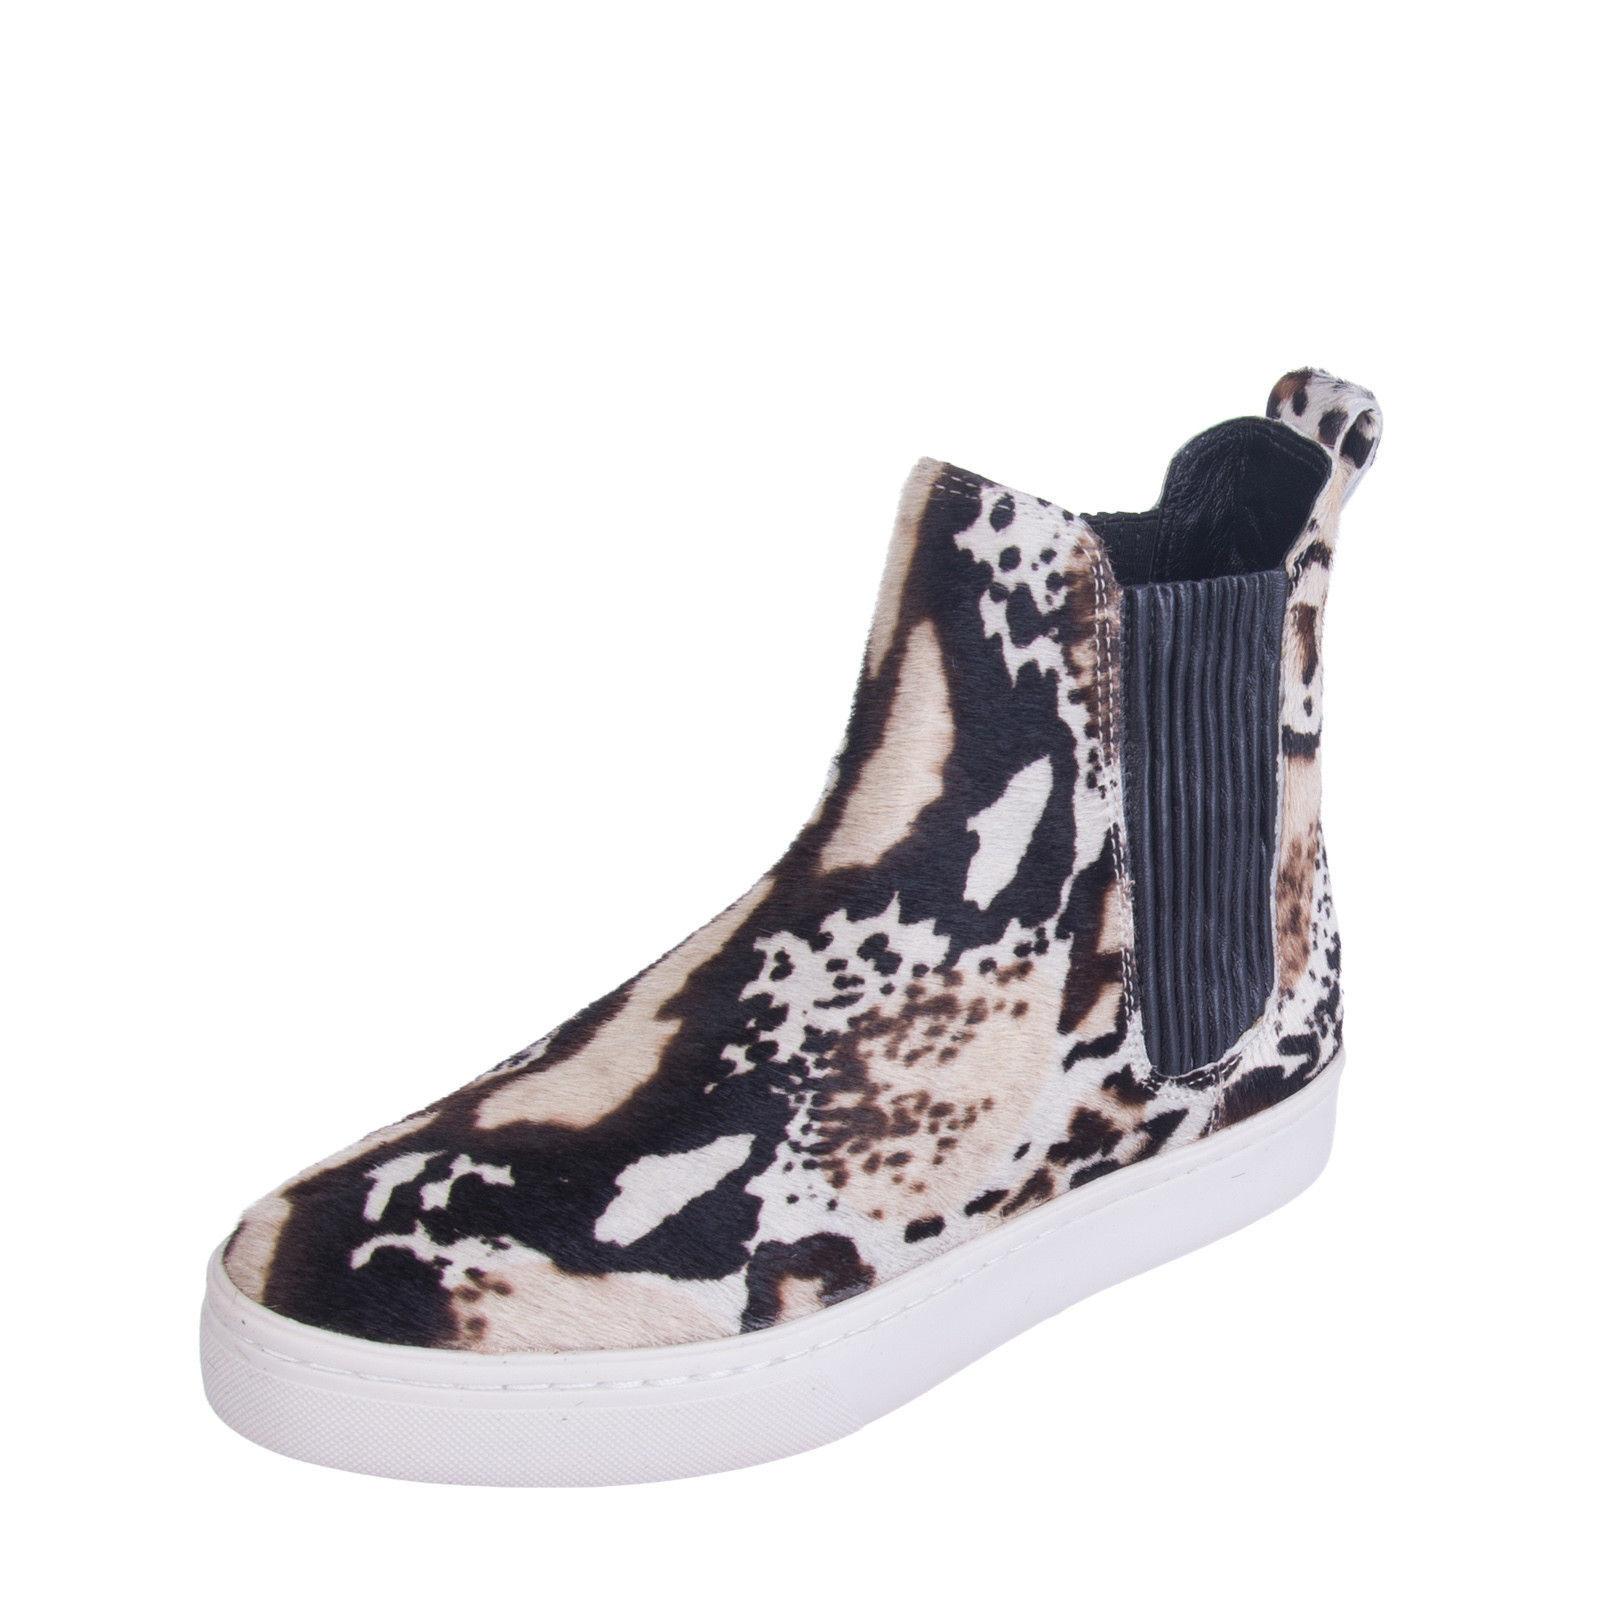 NEW LOEFFLER RANDALL Calf Hair Leather Sneaker 38 8.5 Ankle Chelsea Boots  350